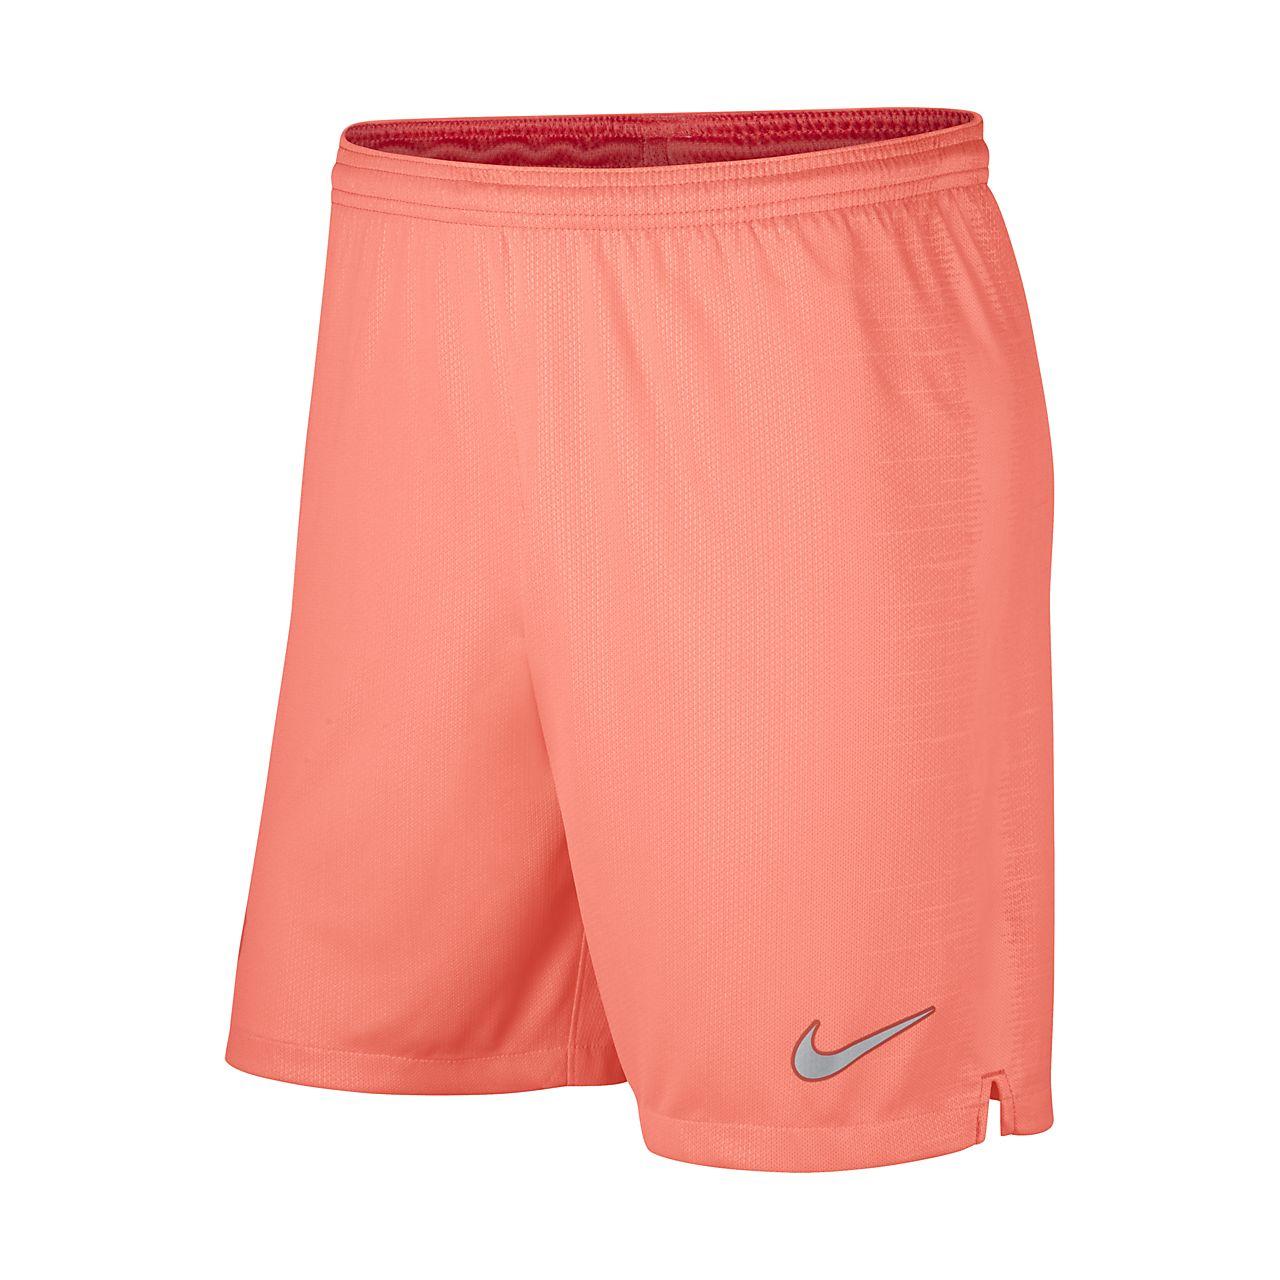 2018/19 FC Barcelona Stadium Third Men's Football Shorts